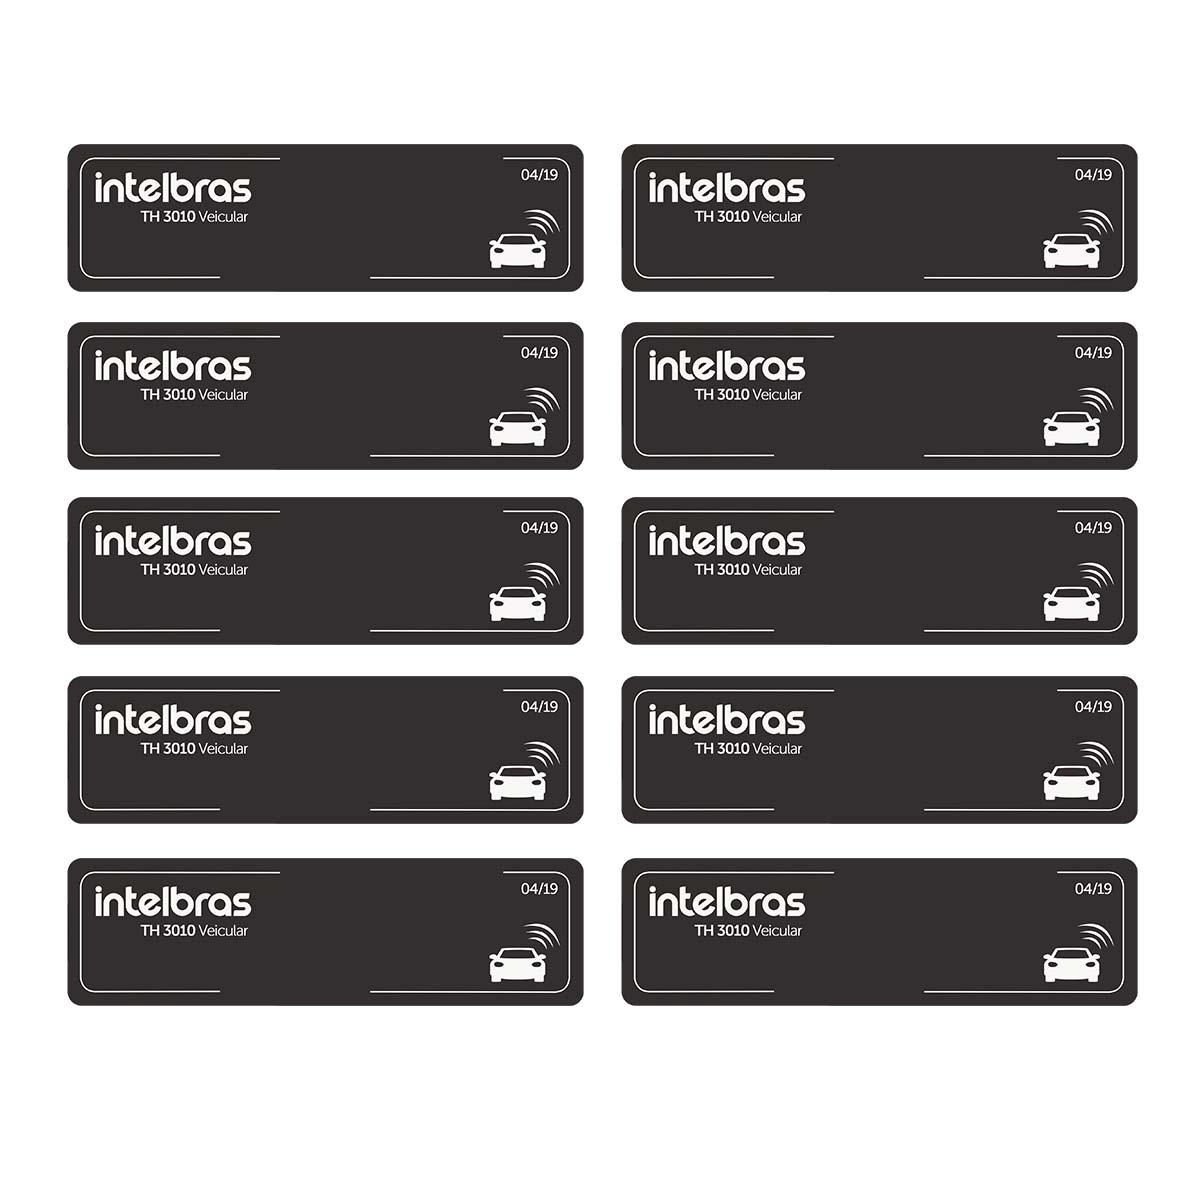 Kit 10 Etiqueta Veicular Intelbras Rfid 900mhz Th 3010